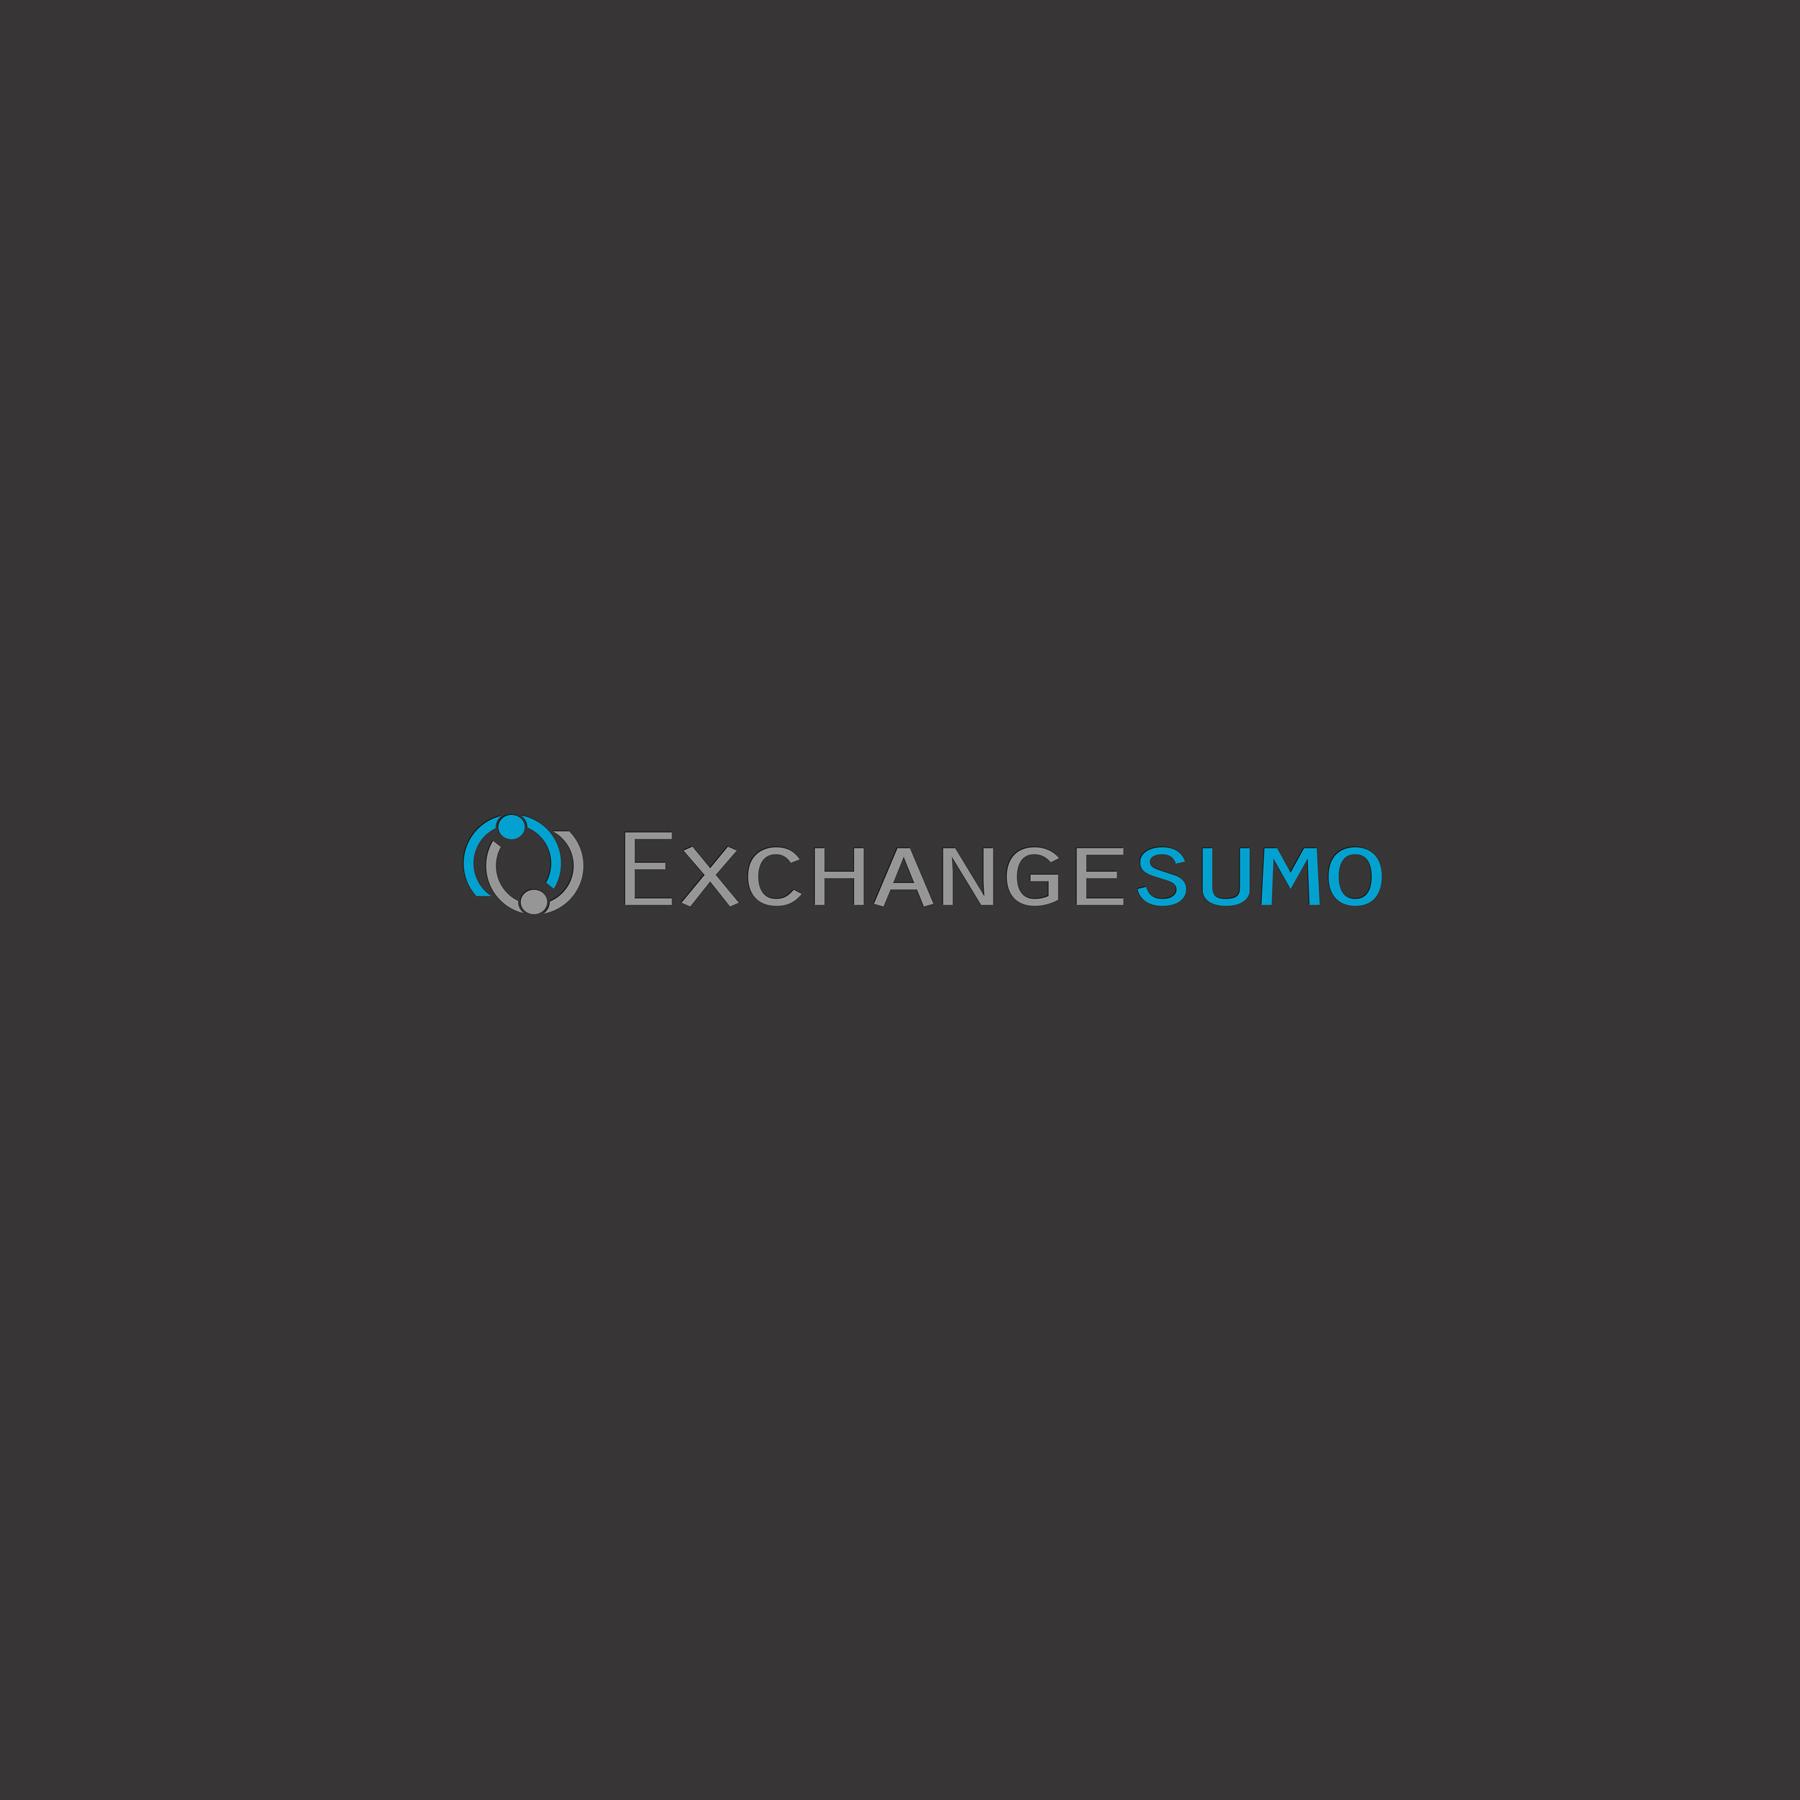 Логотип для мониторинга обменников фото f_9185babbb8ec48c3.jpg